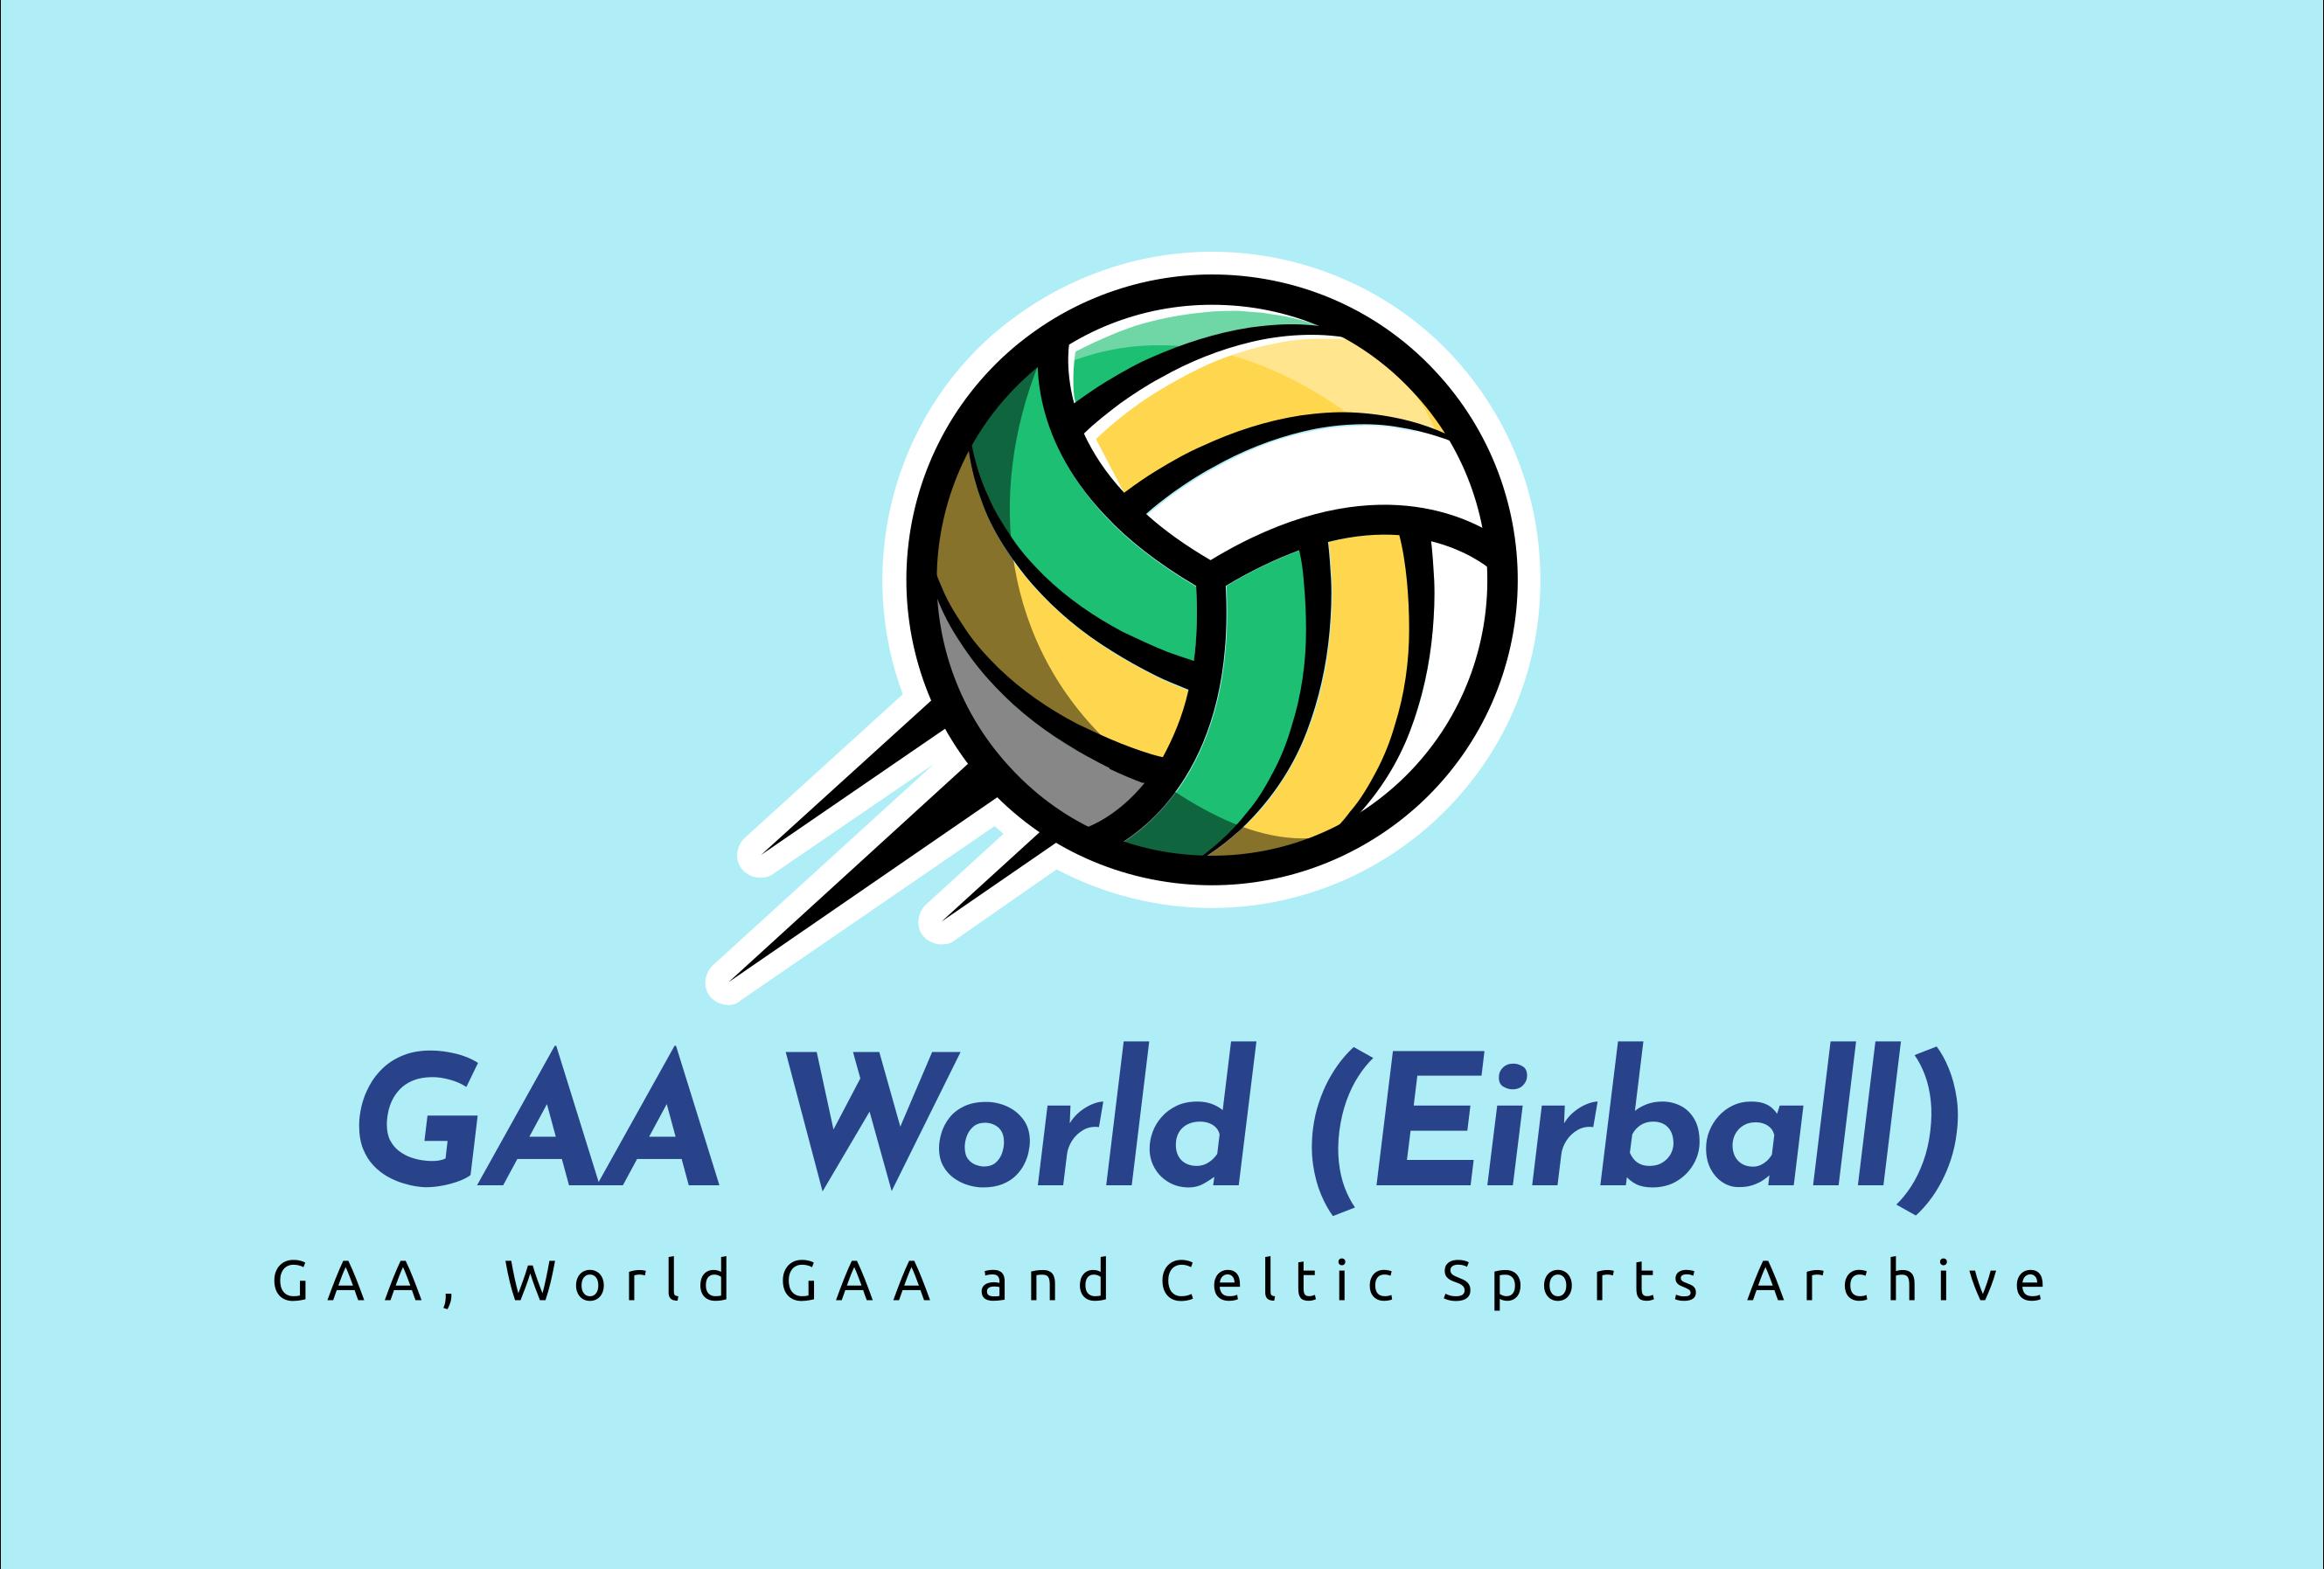 GAA World (Eirball)